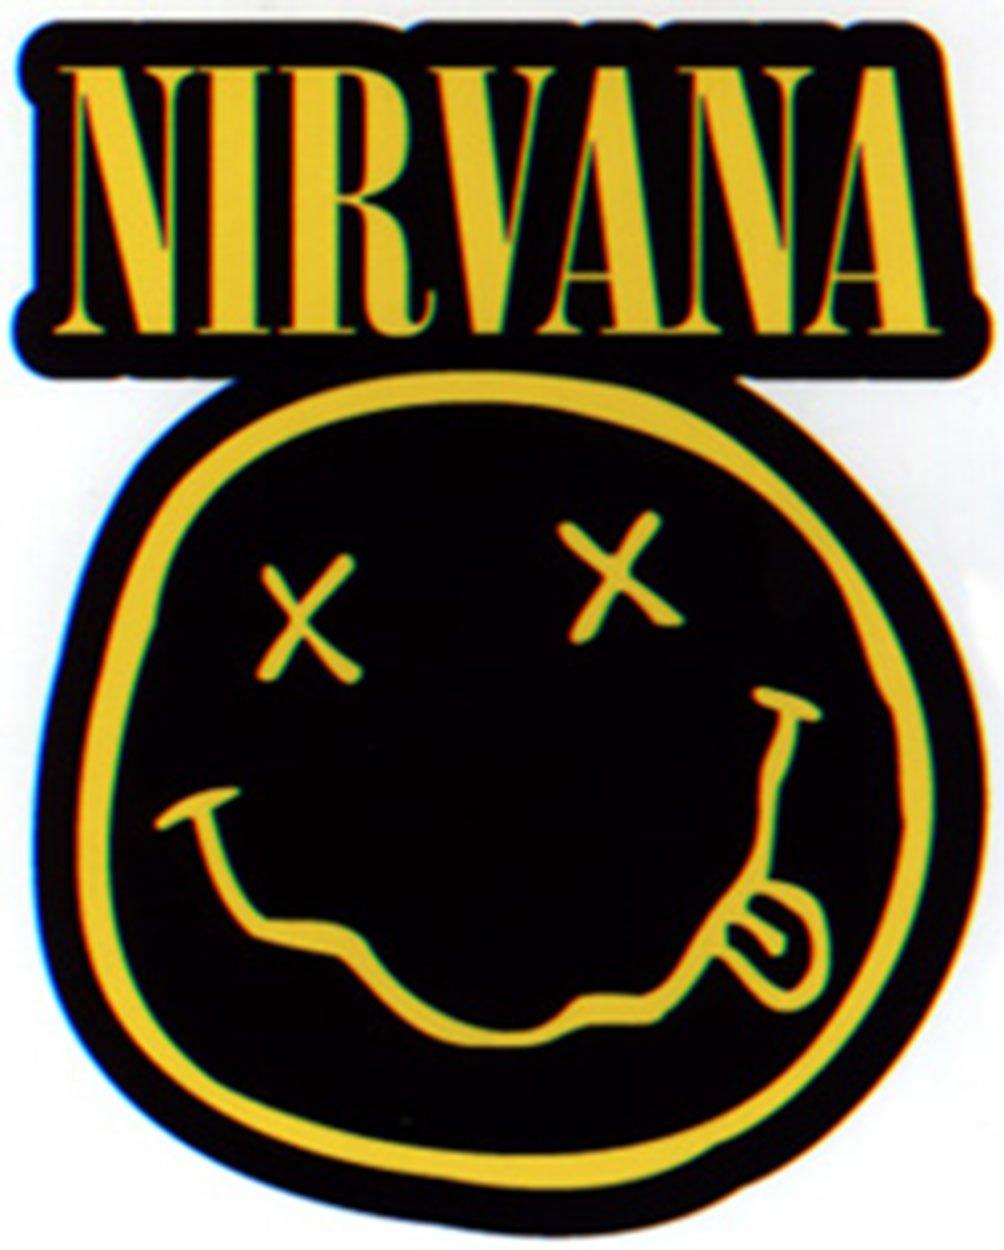 ETIQUETA Officially Oficialmente Licensed Autorizado Classic Rock Artwork ilustraciones 3.25 x 3.6 NIRVANA Smiley Logo STICKER Long Lasting duradera Die-Cut Sticker Etiqueta DECAL CALCOMANIA